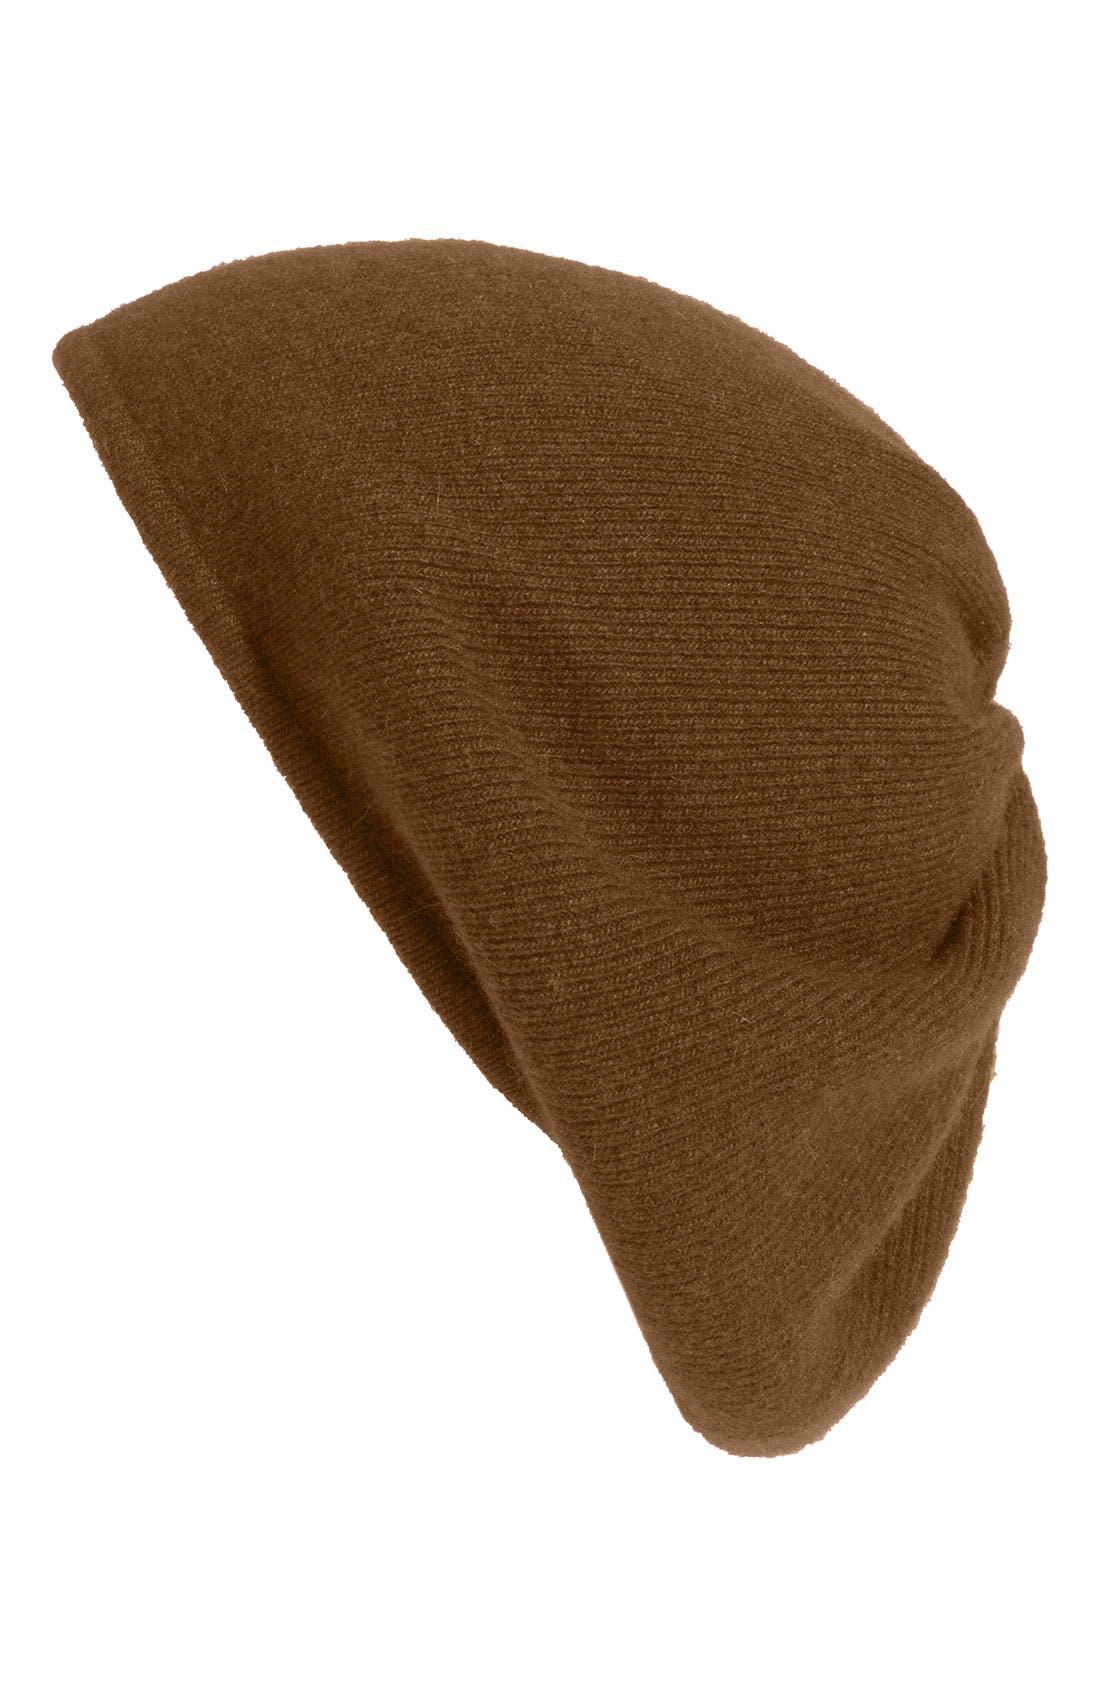 Main Image - Portolano 'Item' Knit Hat